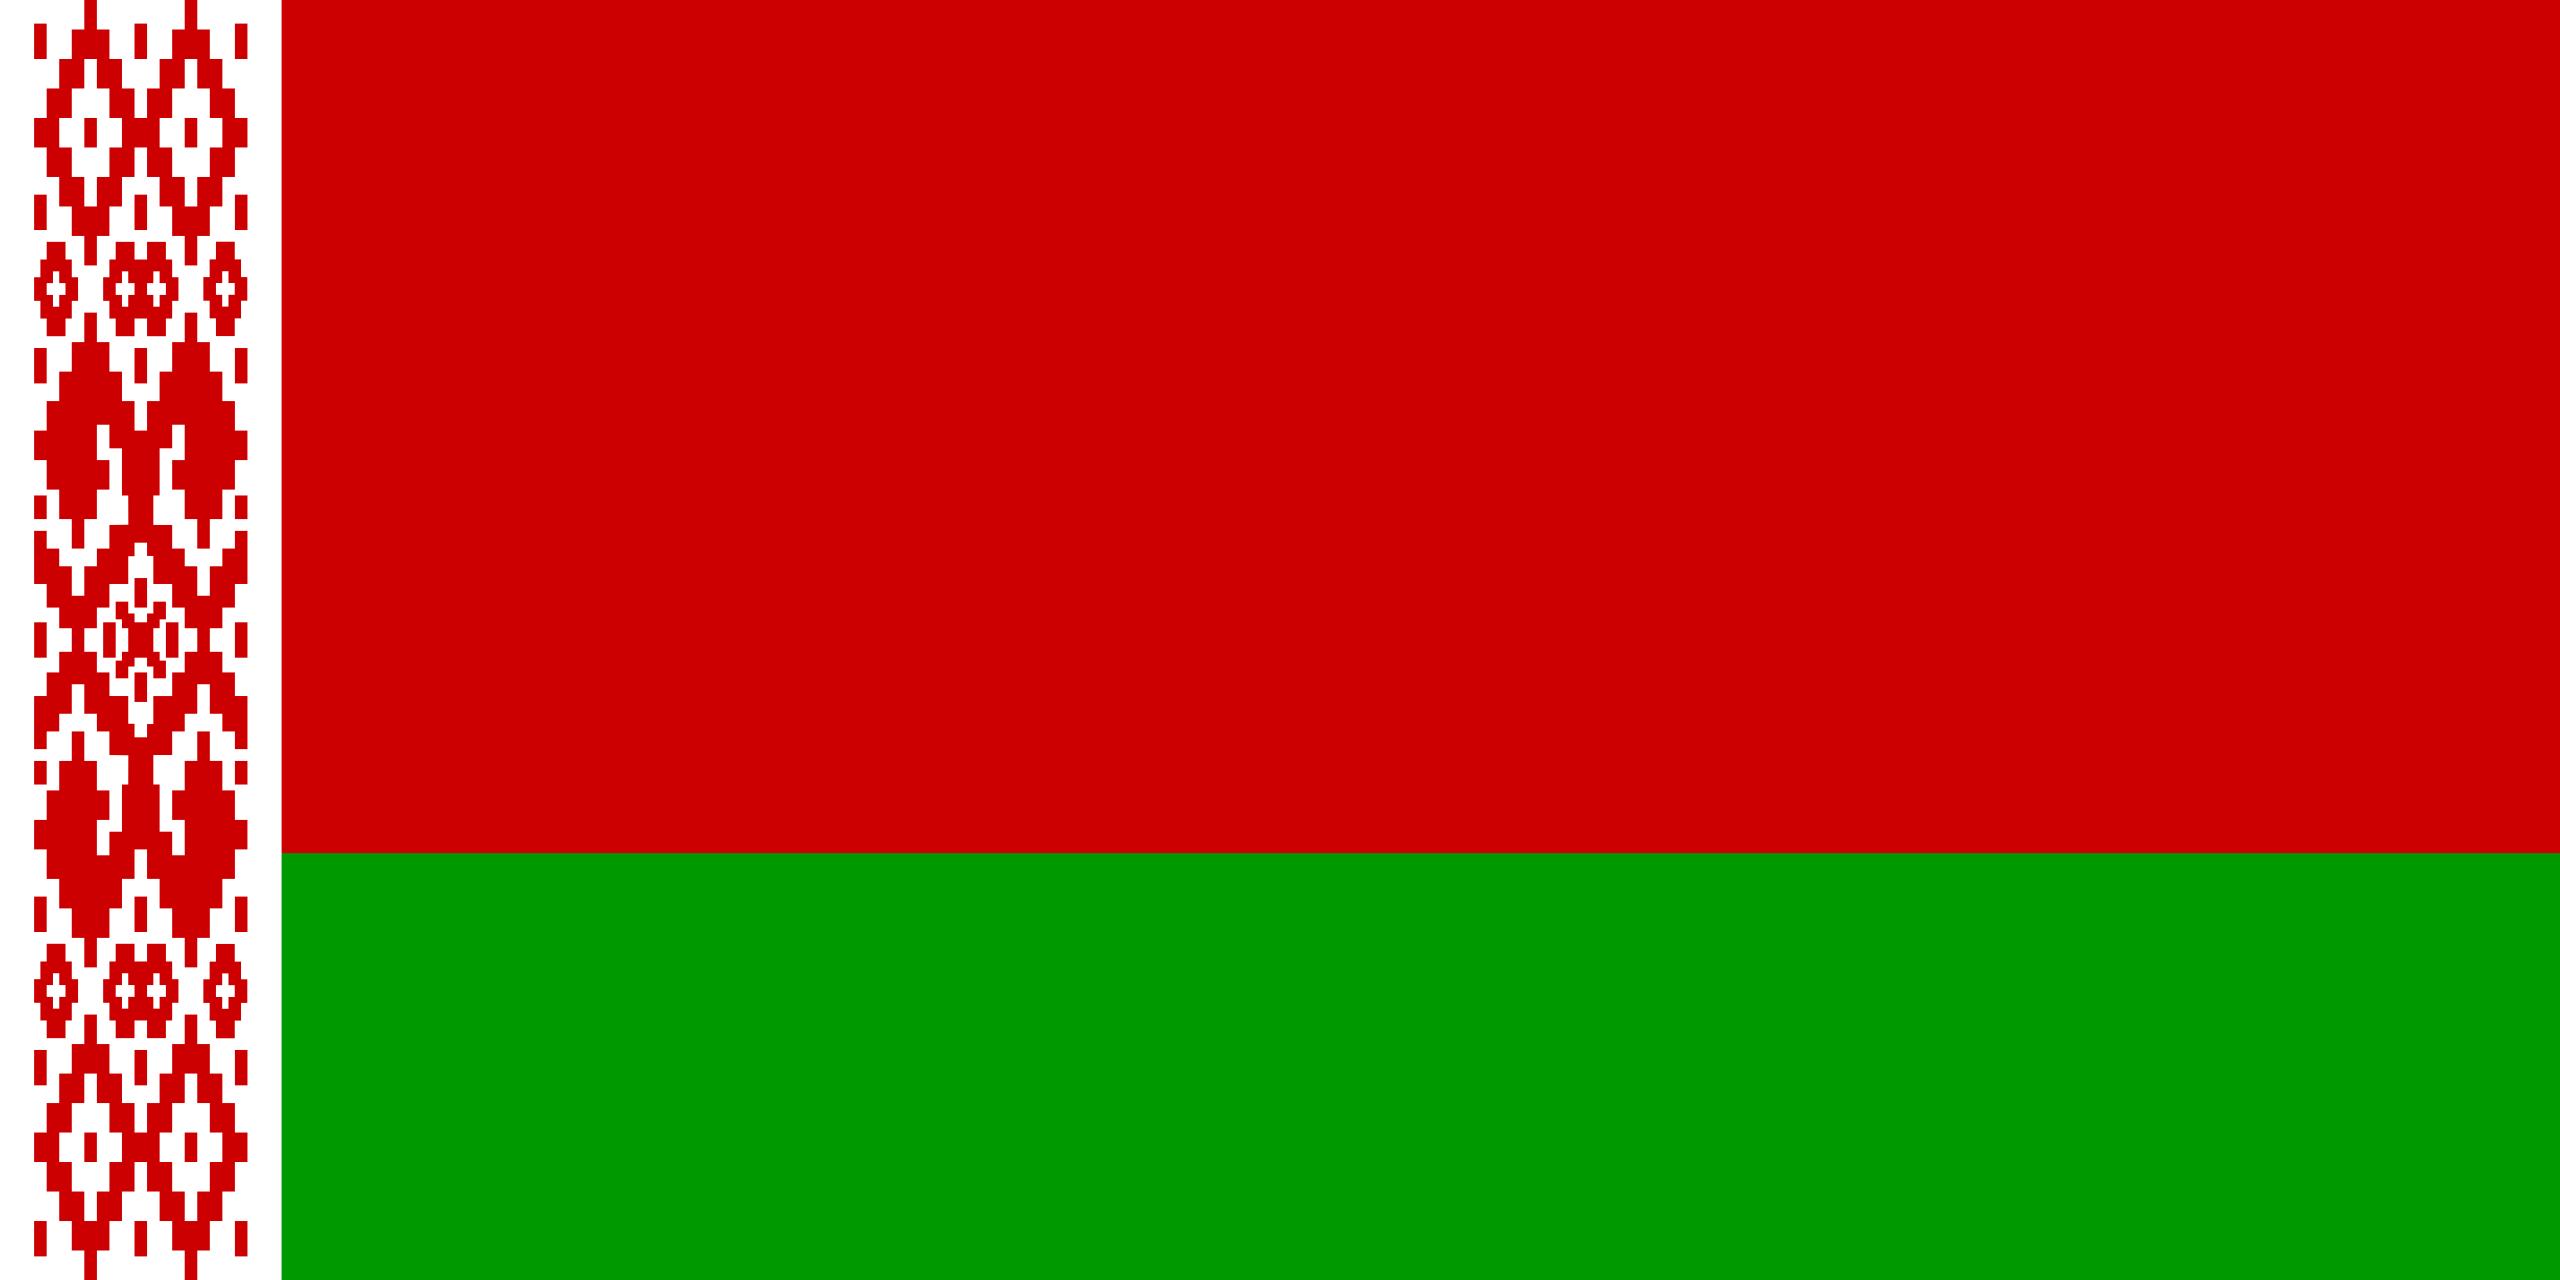 bielorrusia, país, Brasão de armas, logotipo, símbolo - Papéis de parede HD - Professor-falken.com